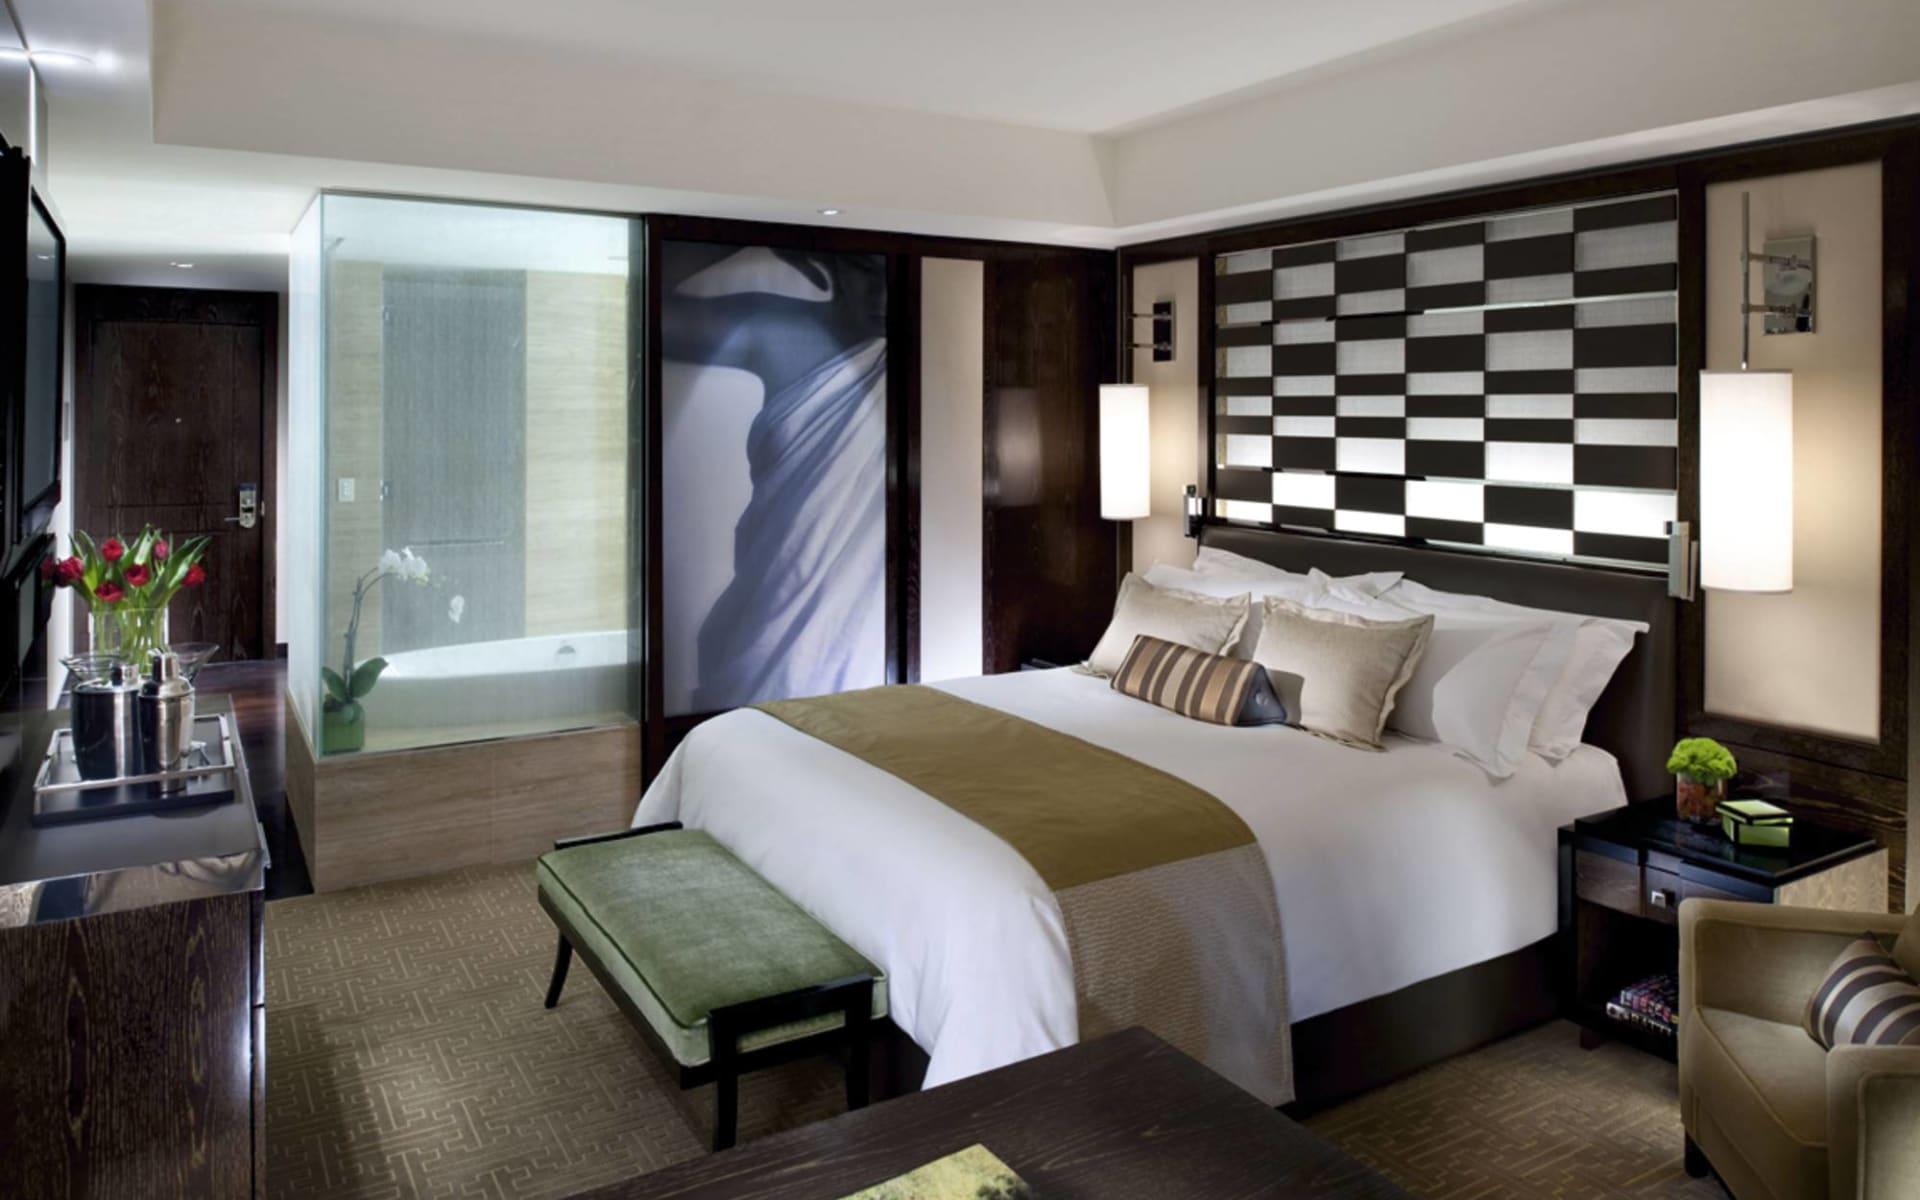 Waldorf Astoria Las Vegas:  Waldorf Astoria Las Vegas - Doppelzimmer